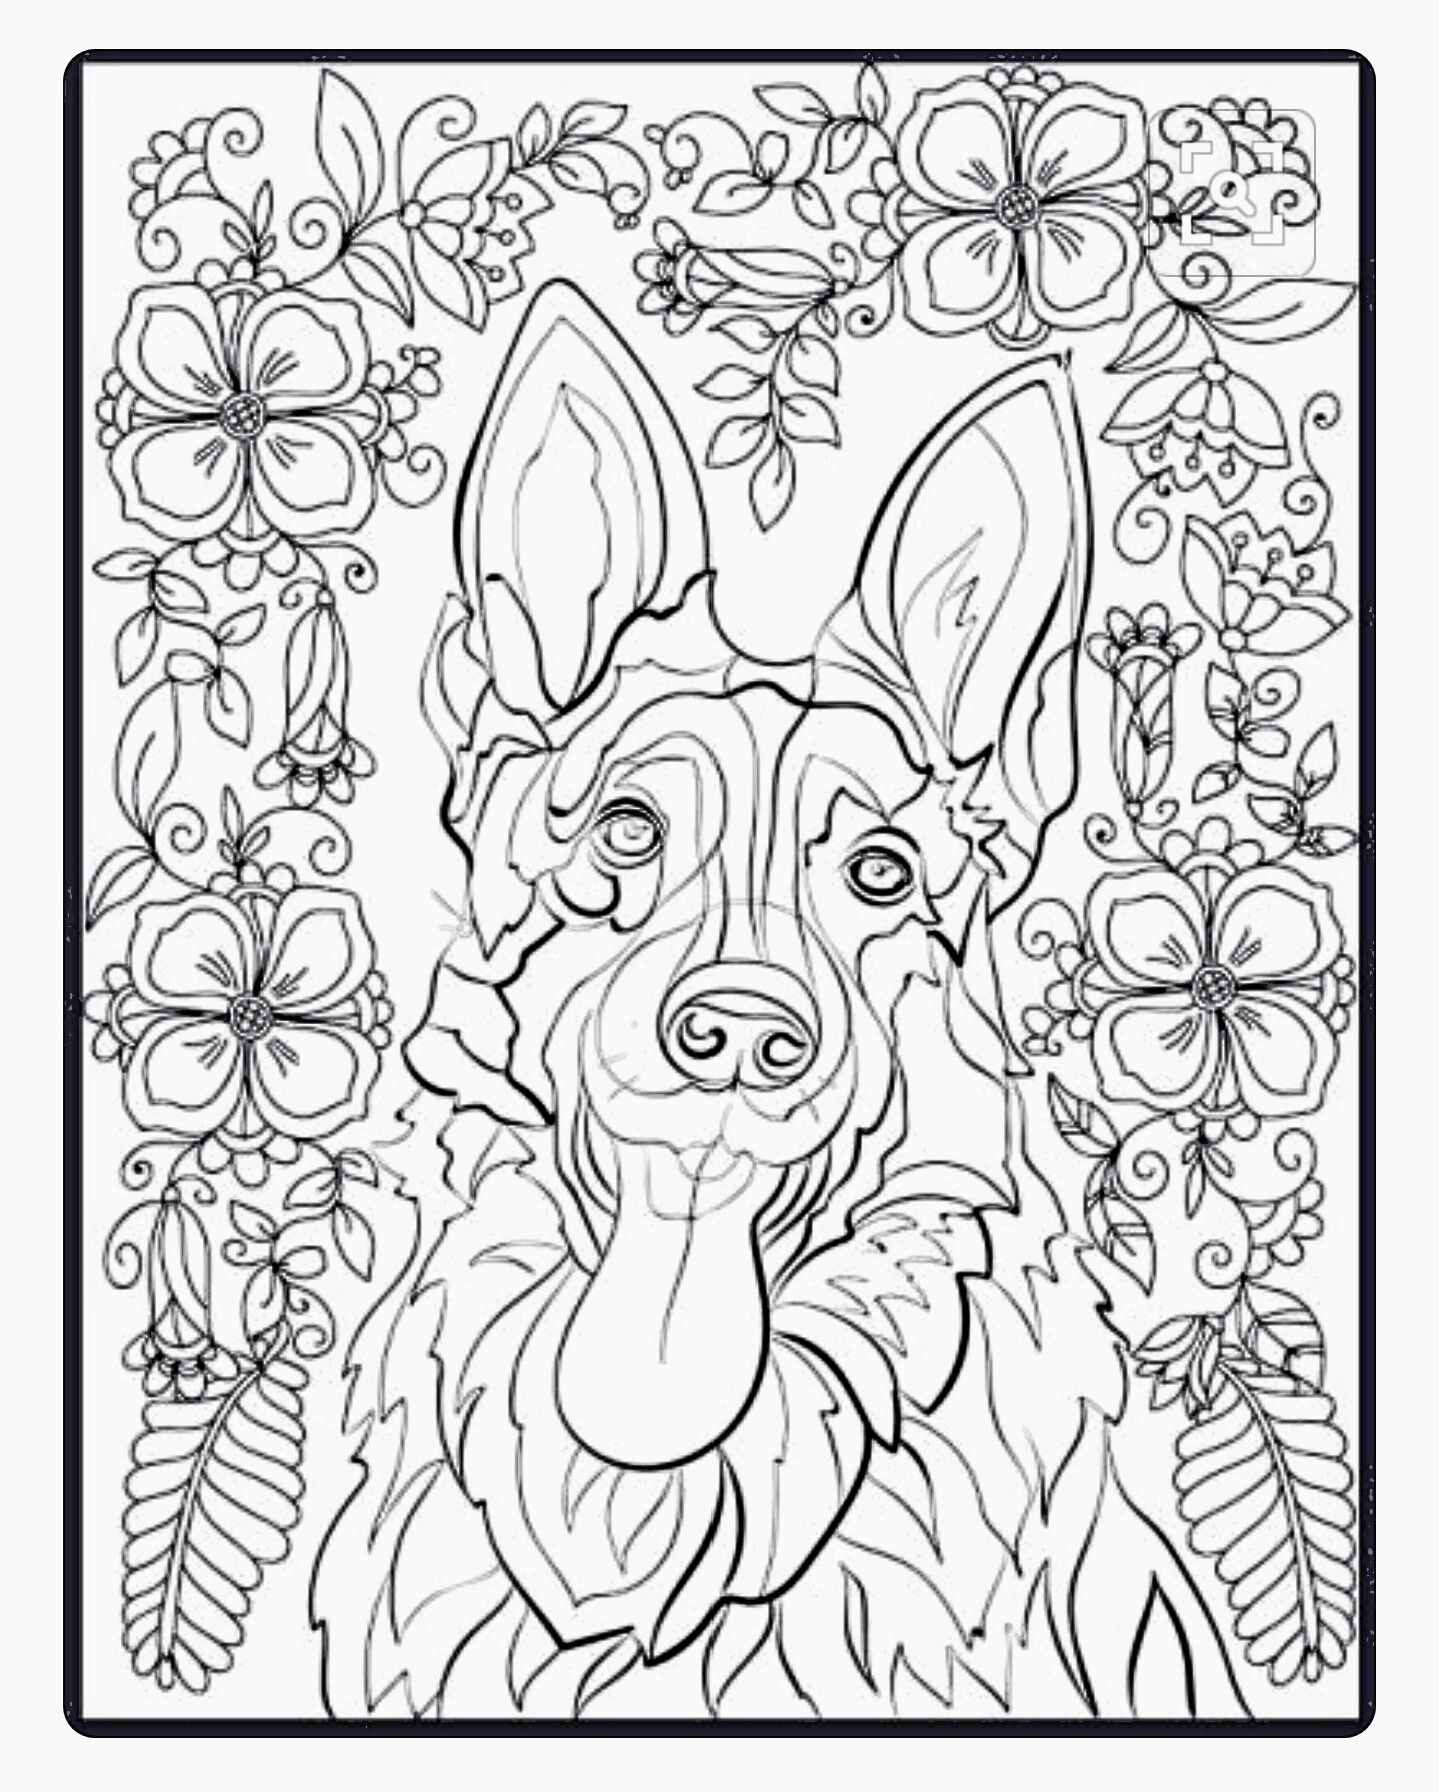 German Shepherd Coloring Page Horse Coloring Pages Dog Coloring Book Dog Coloring Page